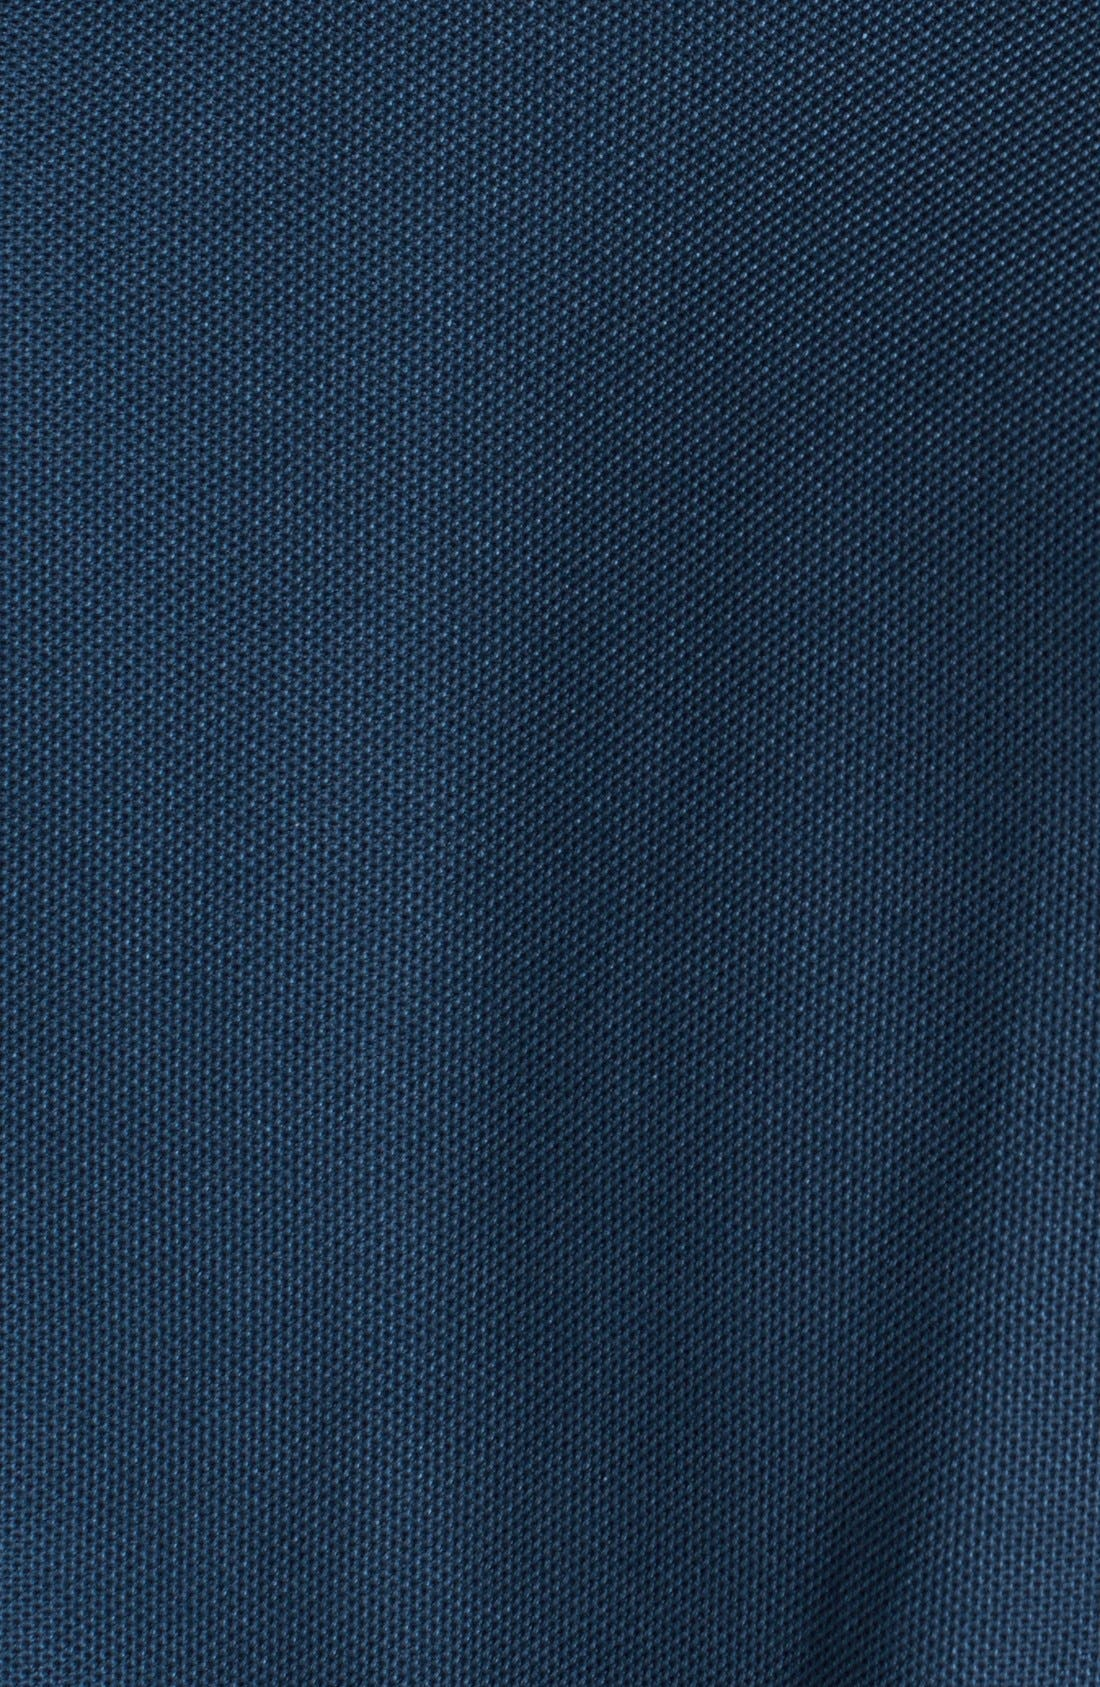 Alternate Image 3  - Tommy Bahama 'Emfielder' Piqué Polo